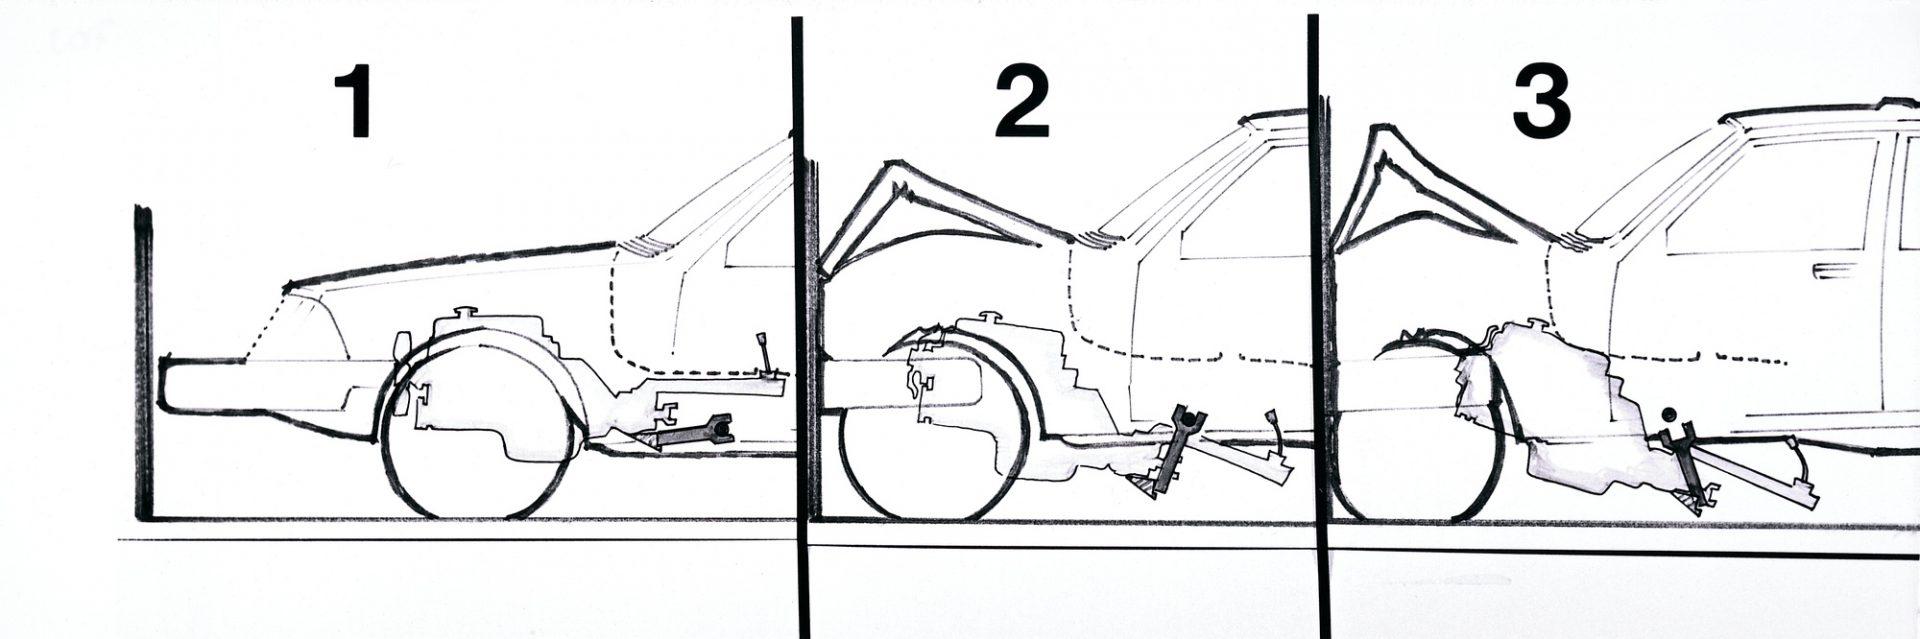 Volvo_VESC_Concept_Car_20559